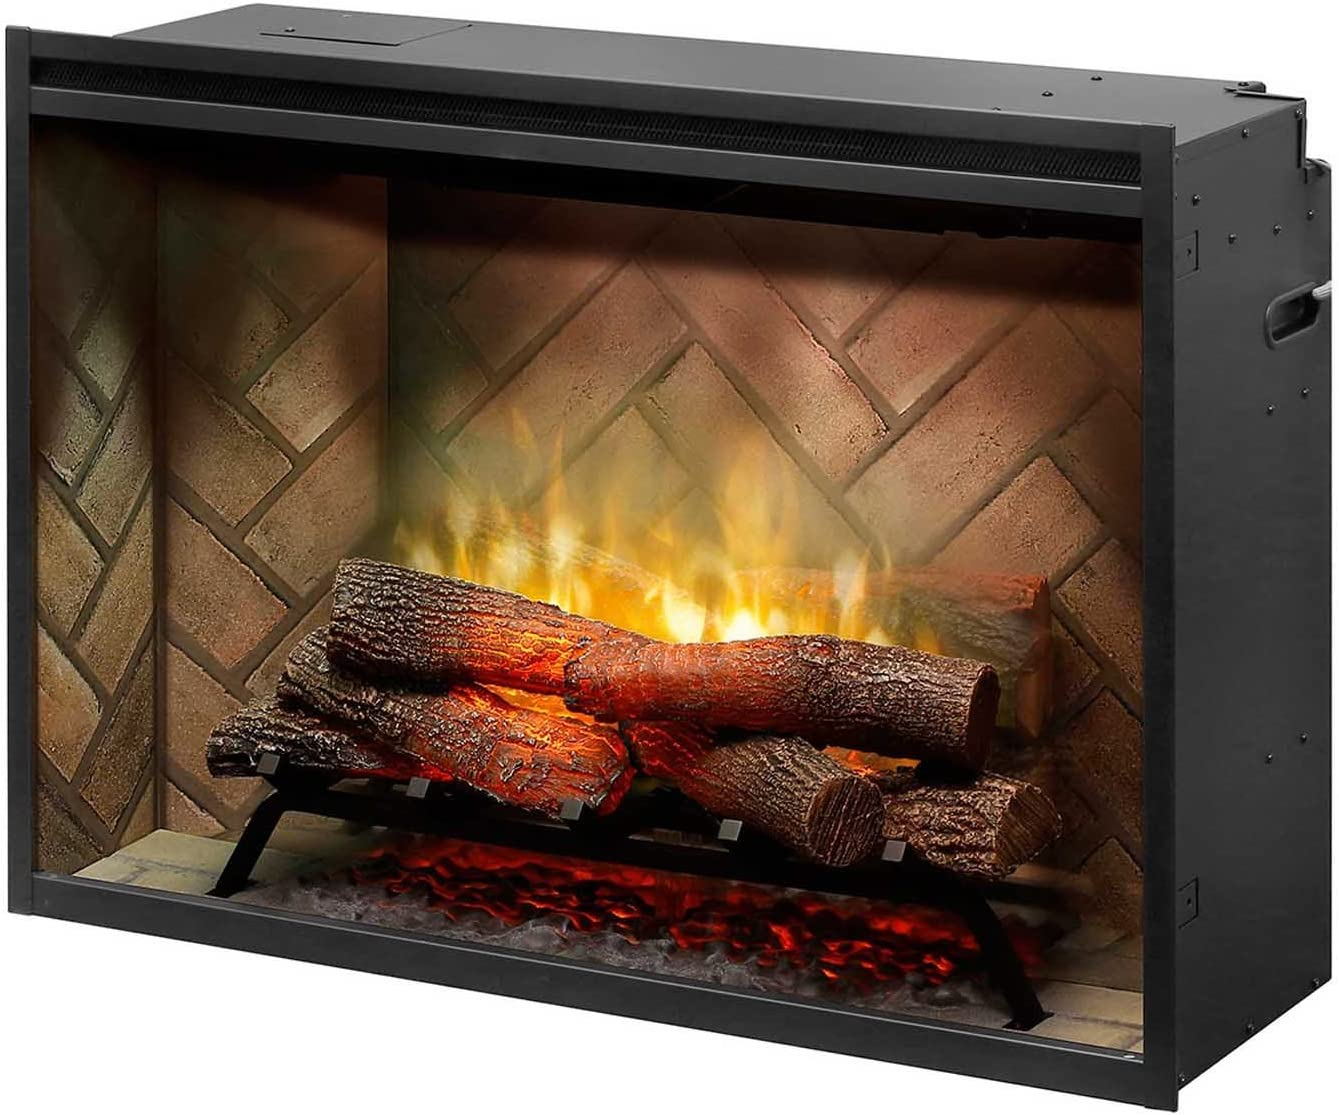 DIMPLEX NORTH AMERICA REVILLUSION Electric Fireplace, Gloss Black